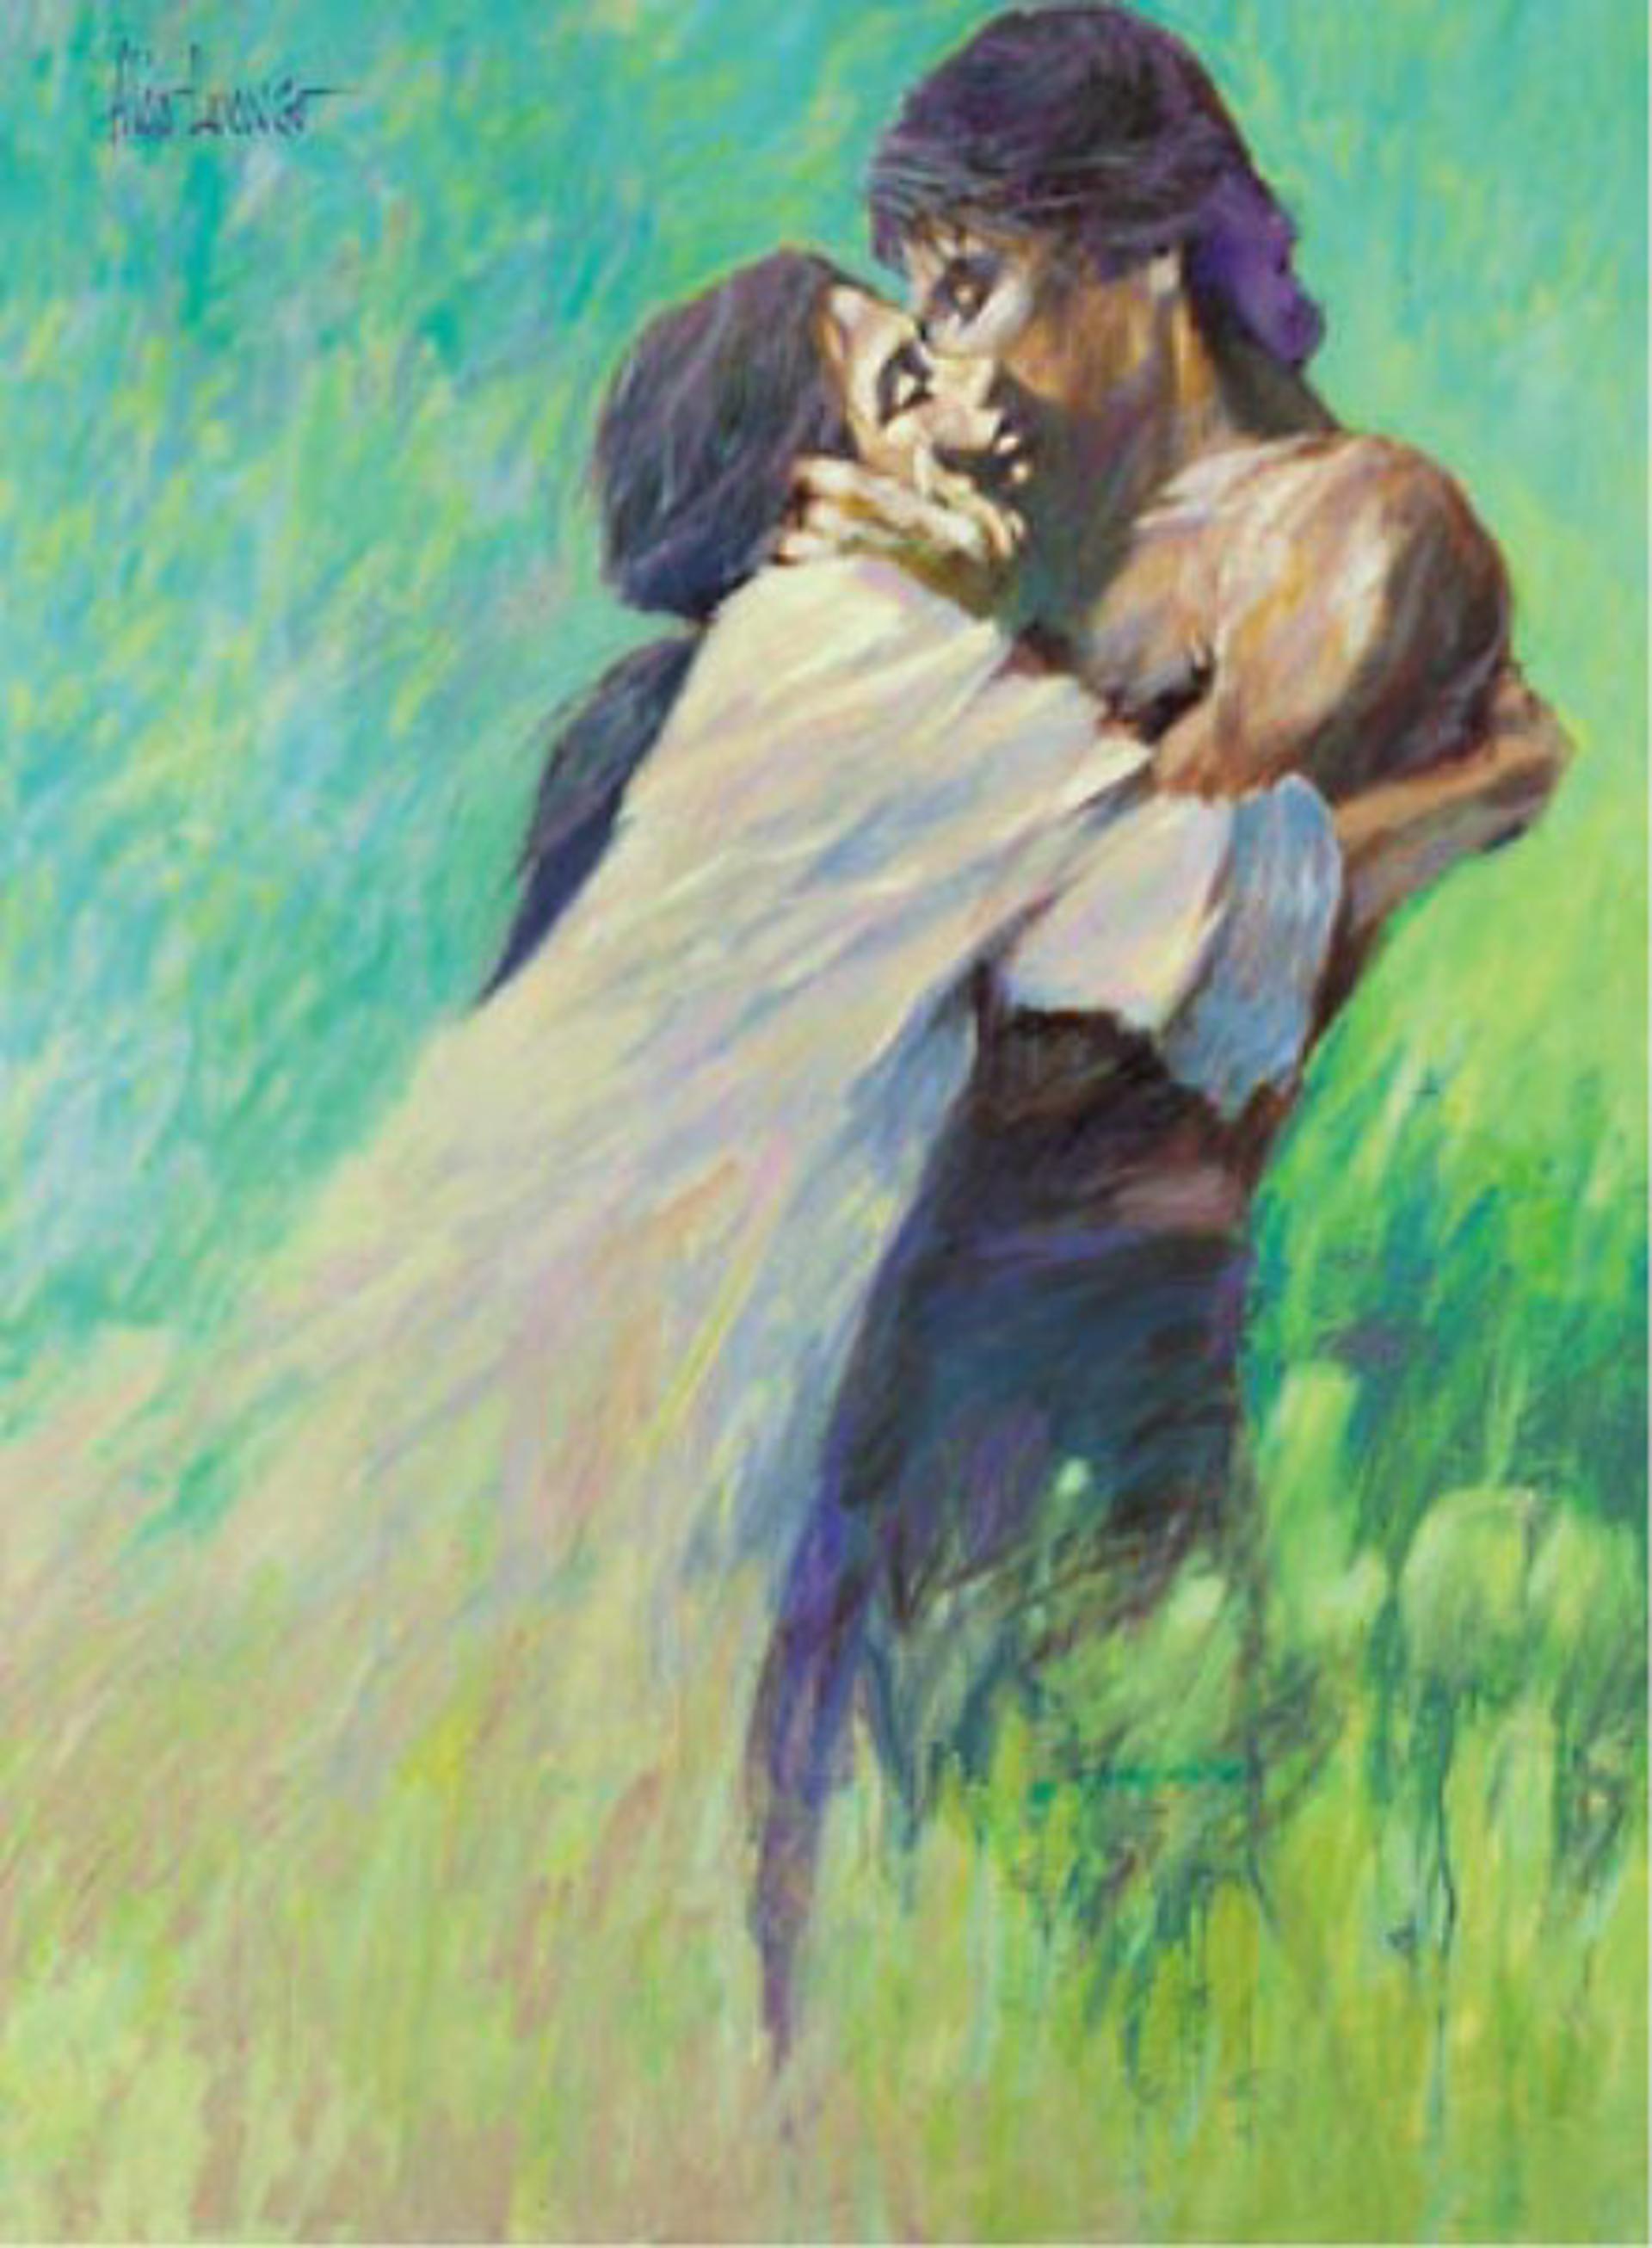 My Soft Purple Dream by Aldo Luongo